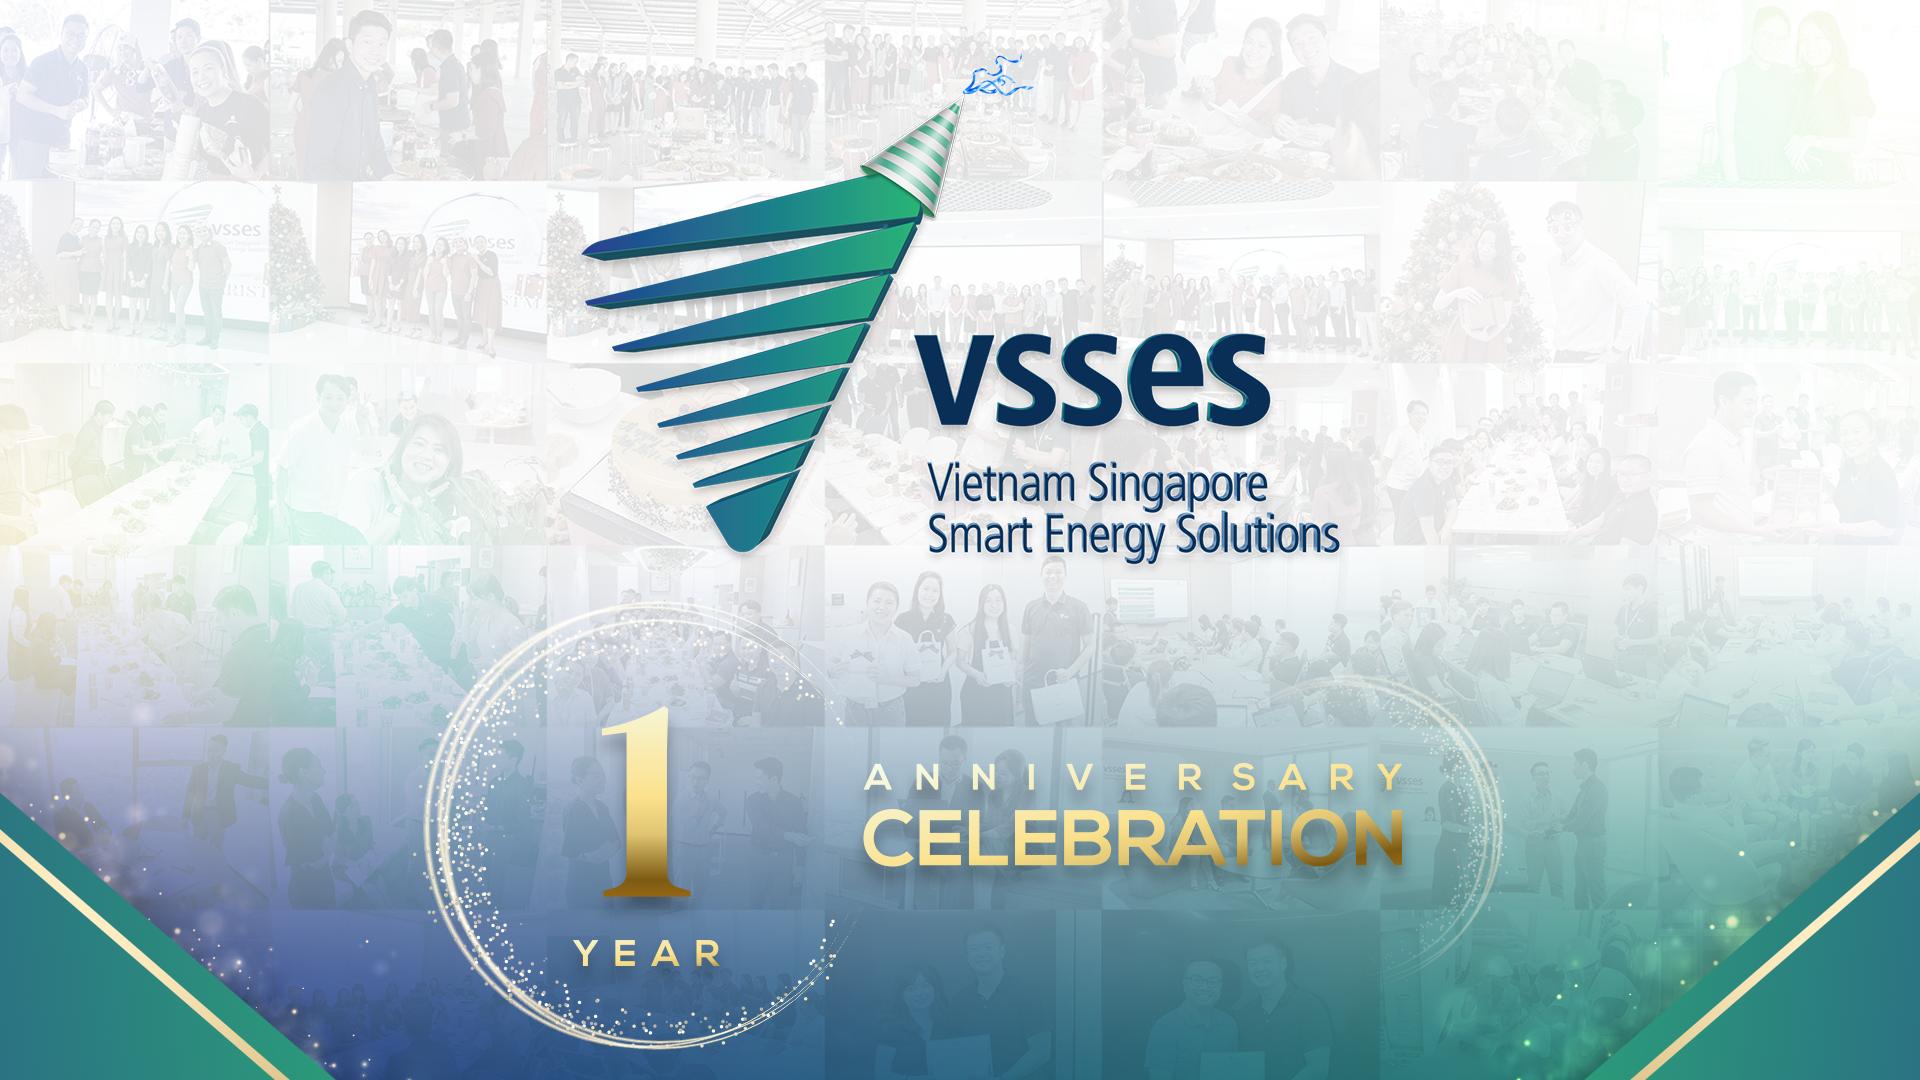 Happy 1st anniversary to VSSES